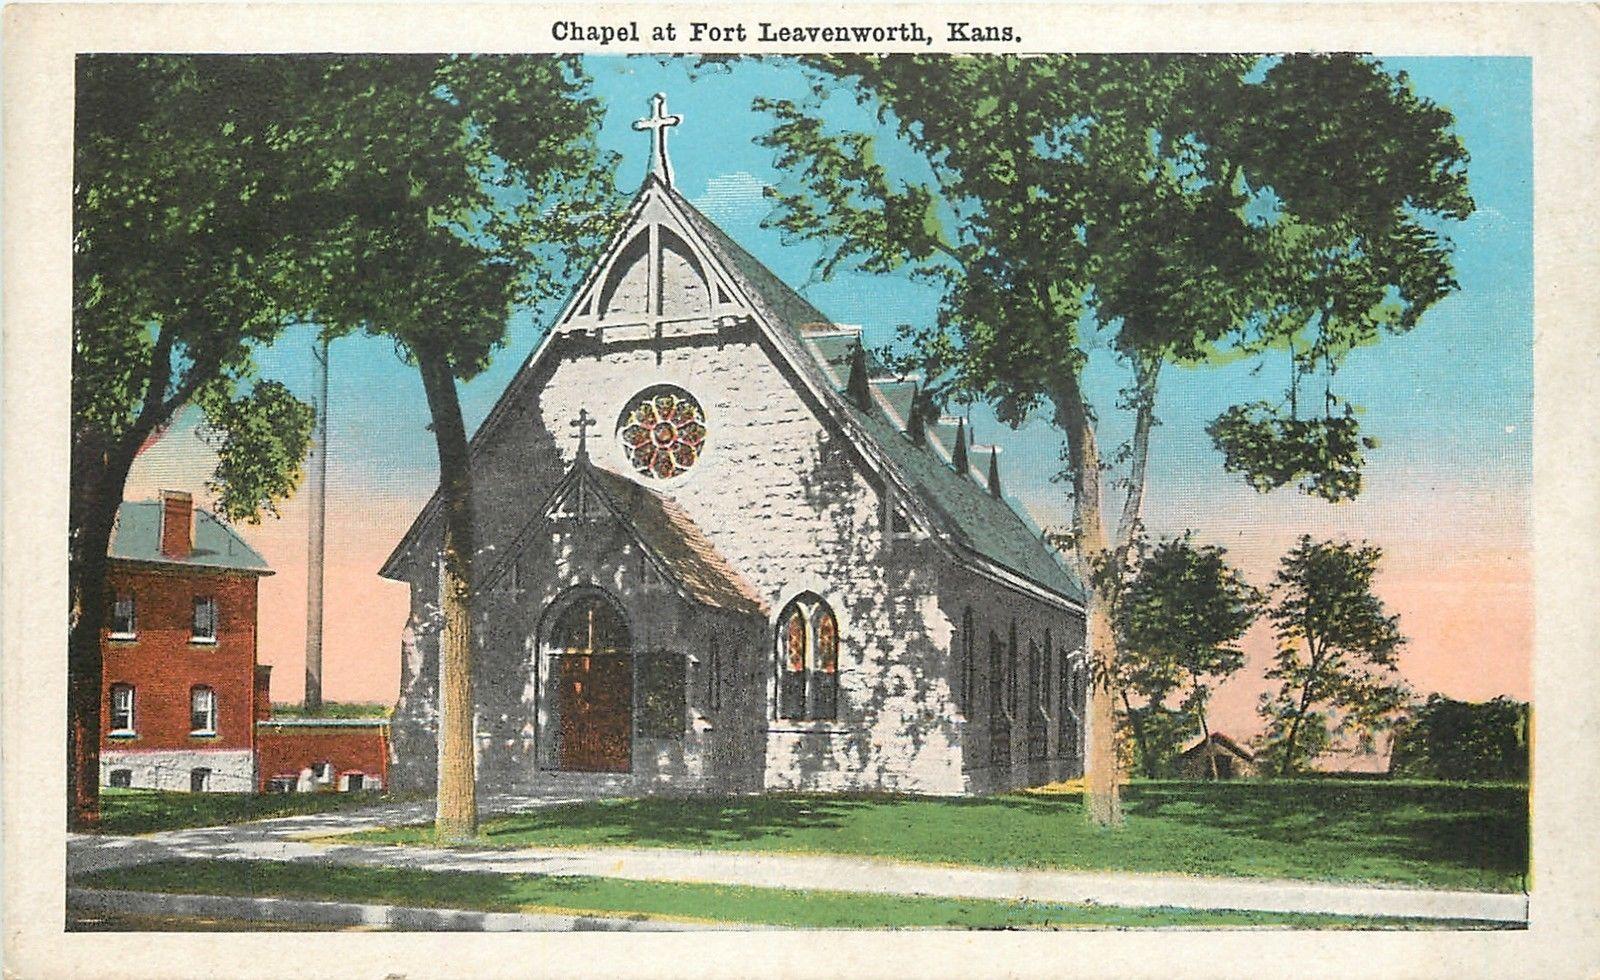 Memorial Chapel, Fort Leavenworth